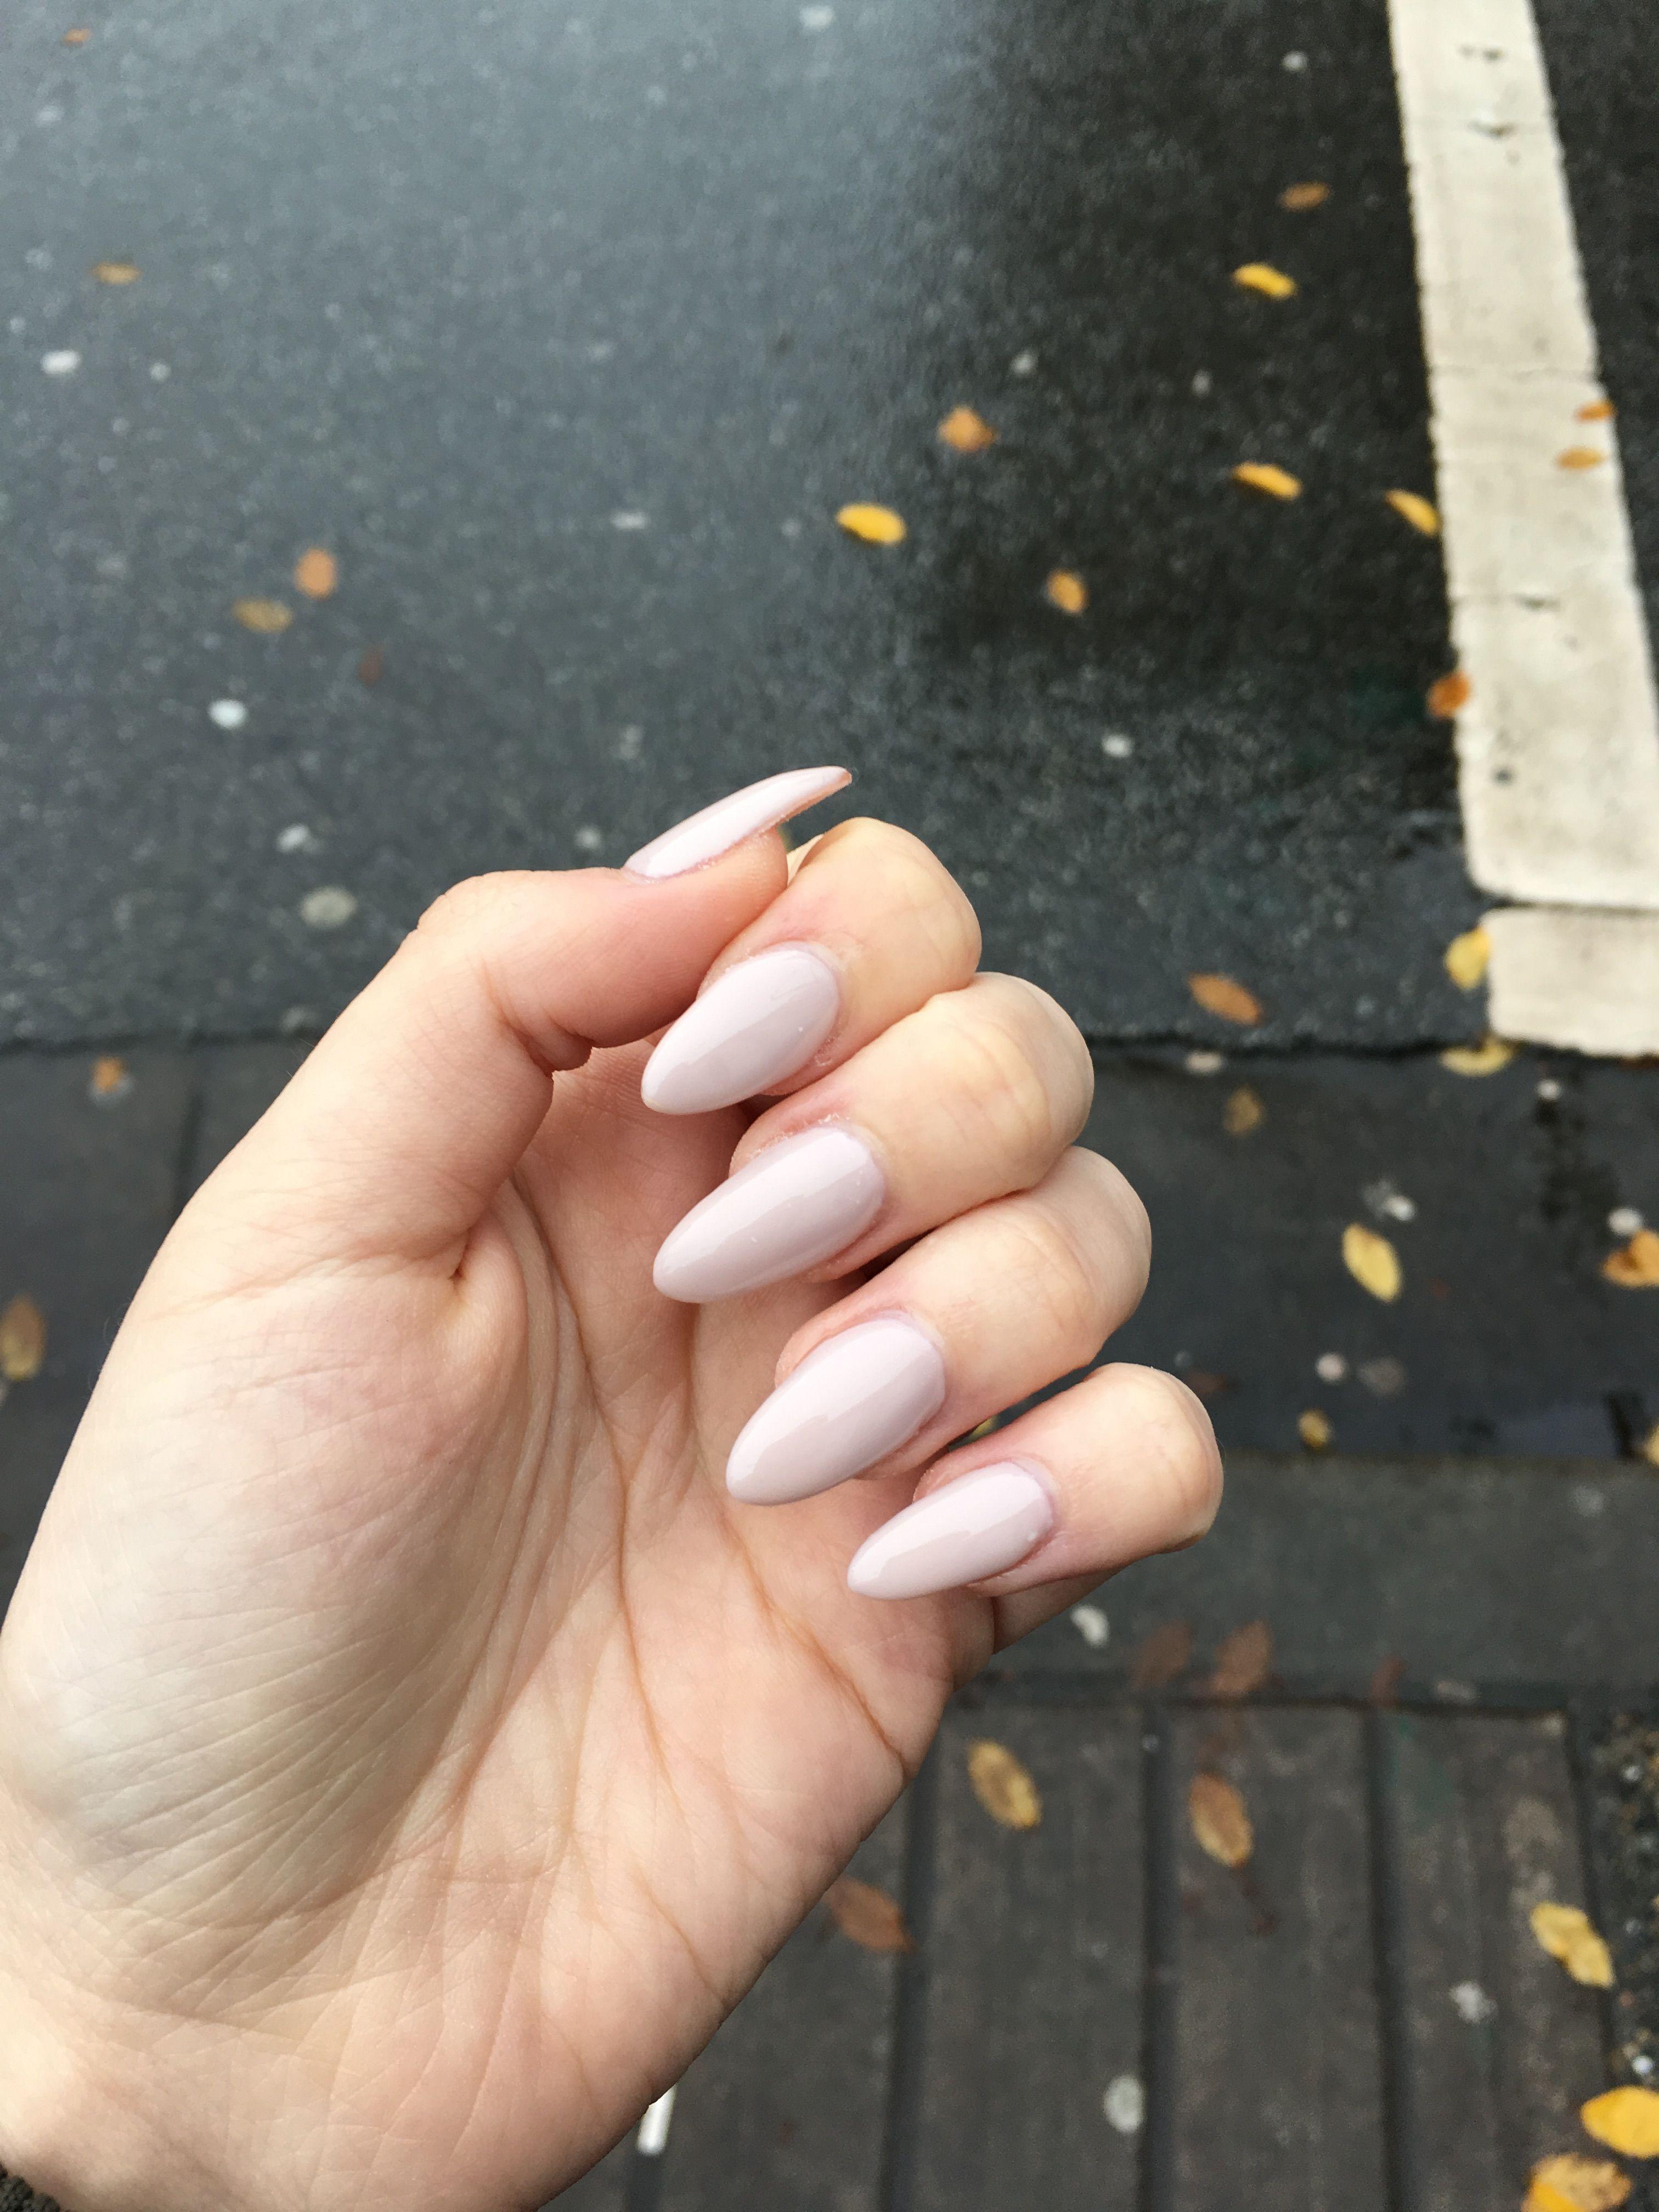 Pin von Angelina Pastukhova auf Almond shape acrylic nails | Pinterest